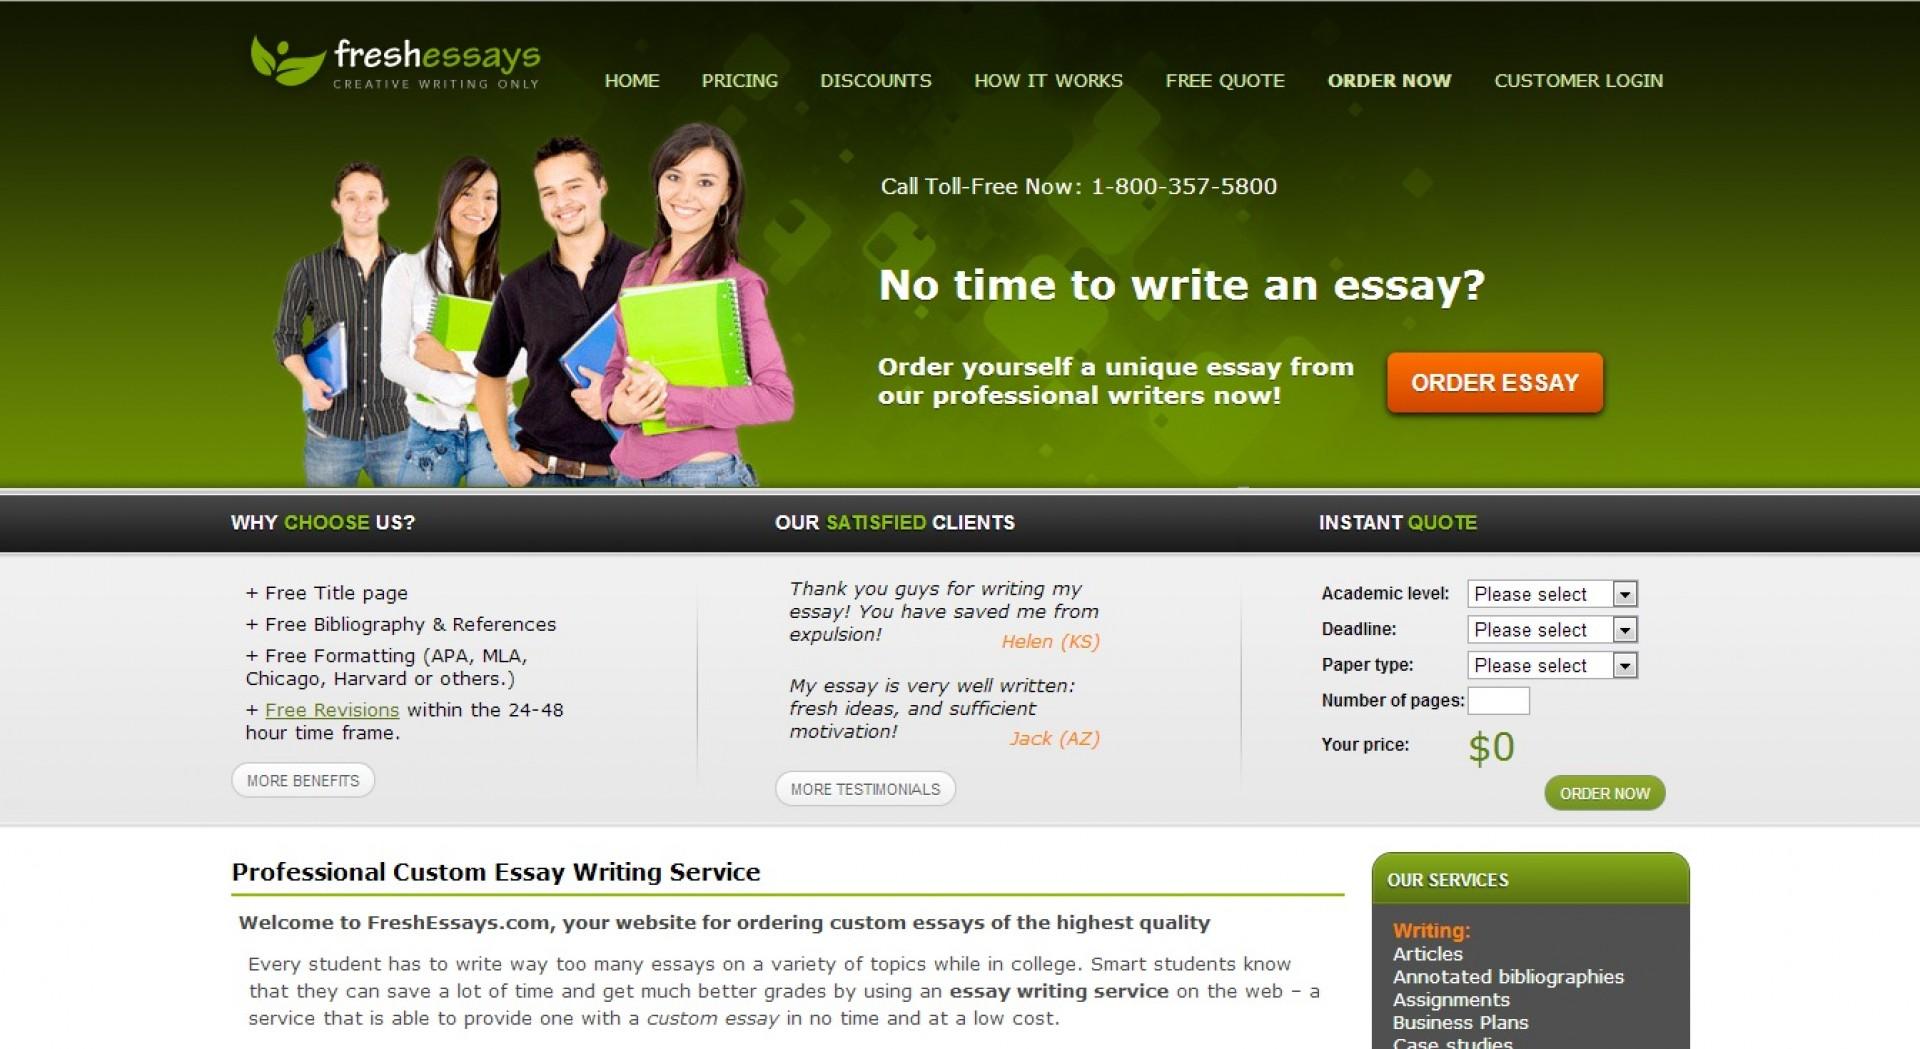 003 Essay Writing Service Reviews Review Who Writes Best Custom Essays Freshe Software Singular Pro Uk Top 1920